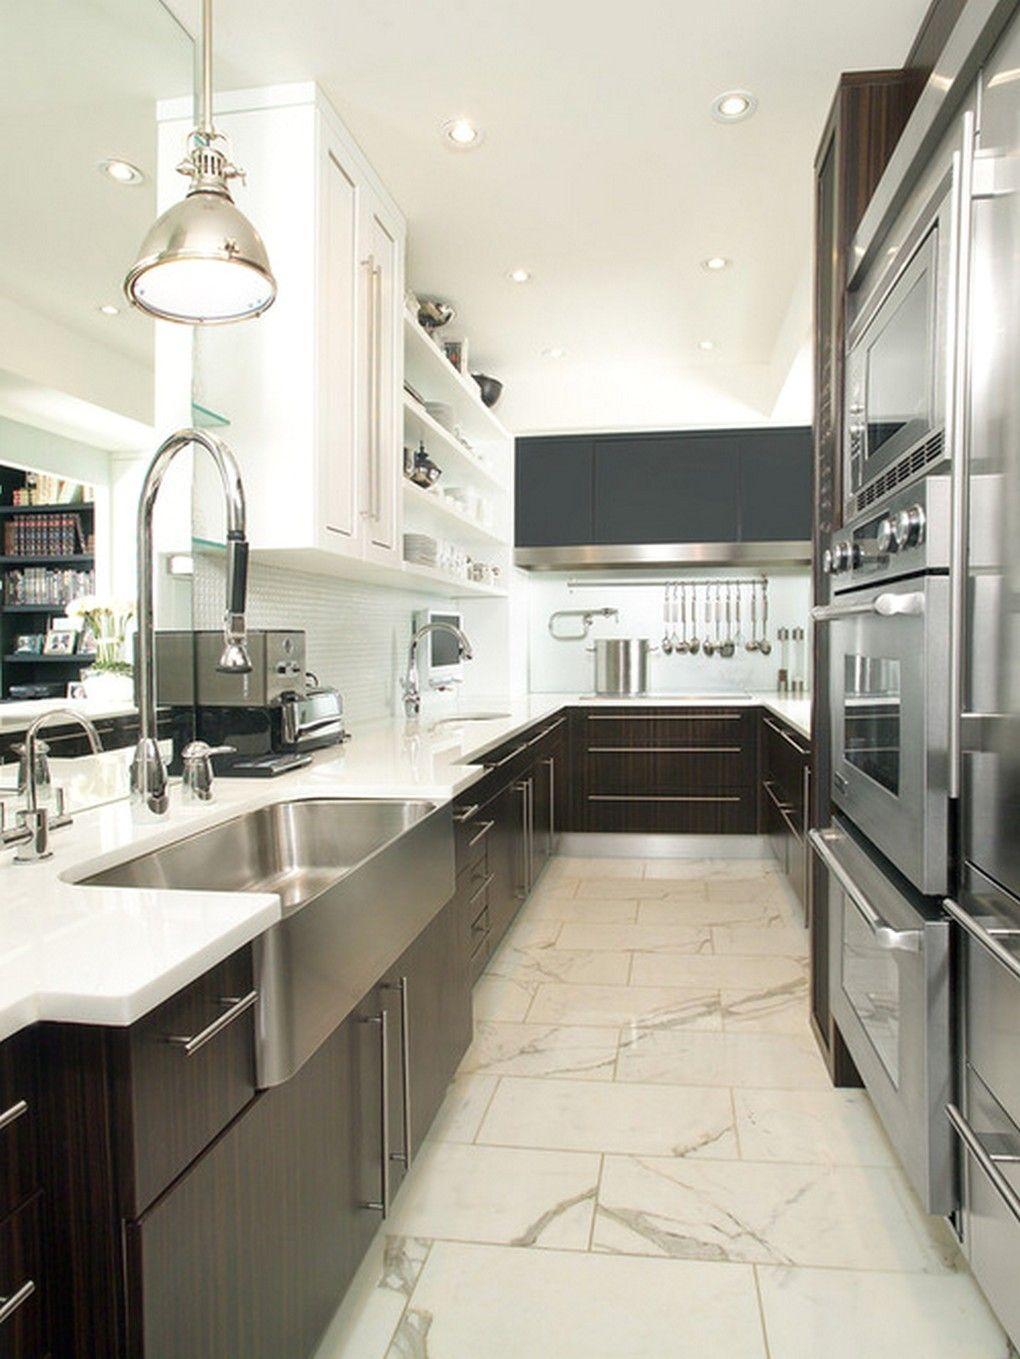 Kitchen Layout Design Tool: Kitchen Countertops Grand Rapids Mi Kitchen Fixtures